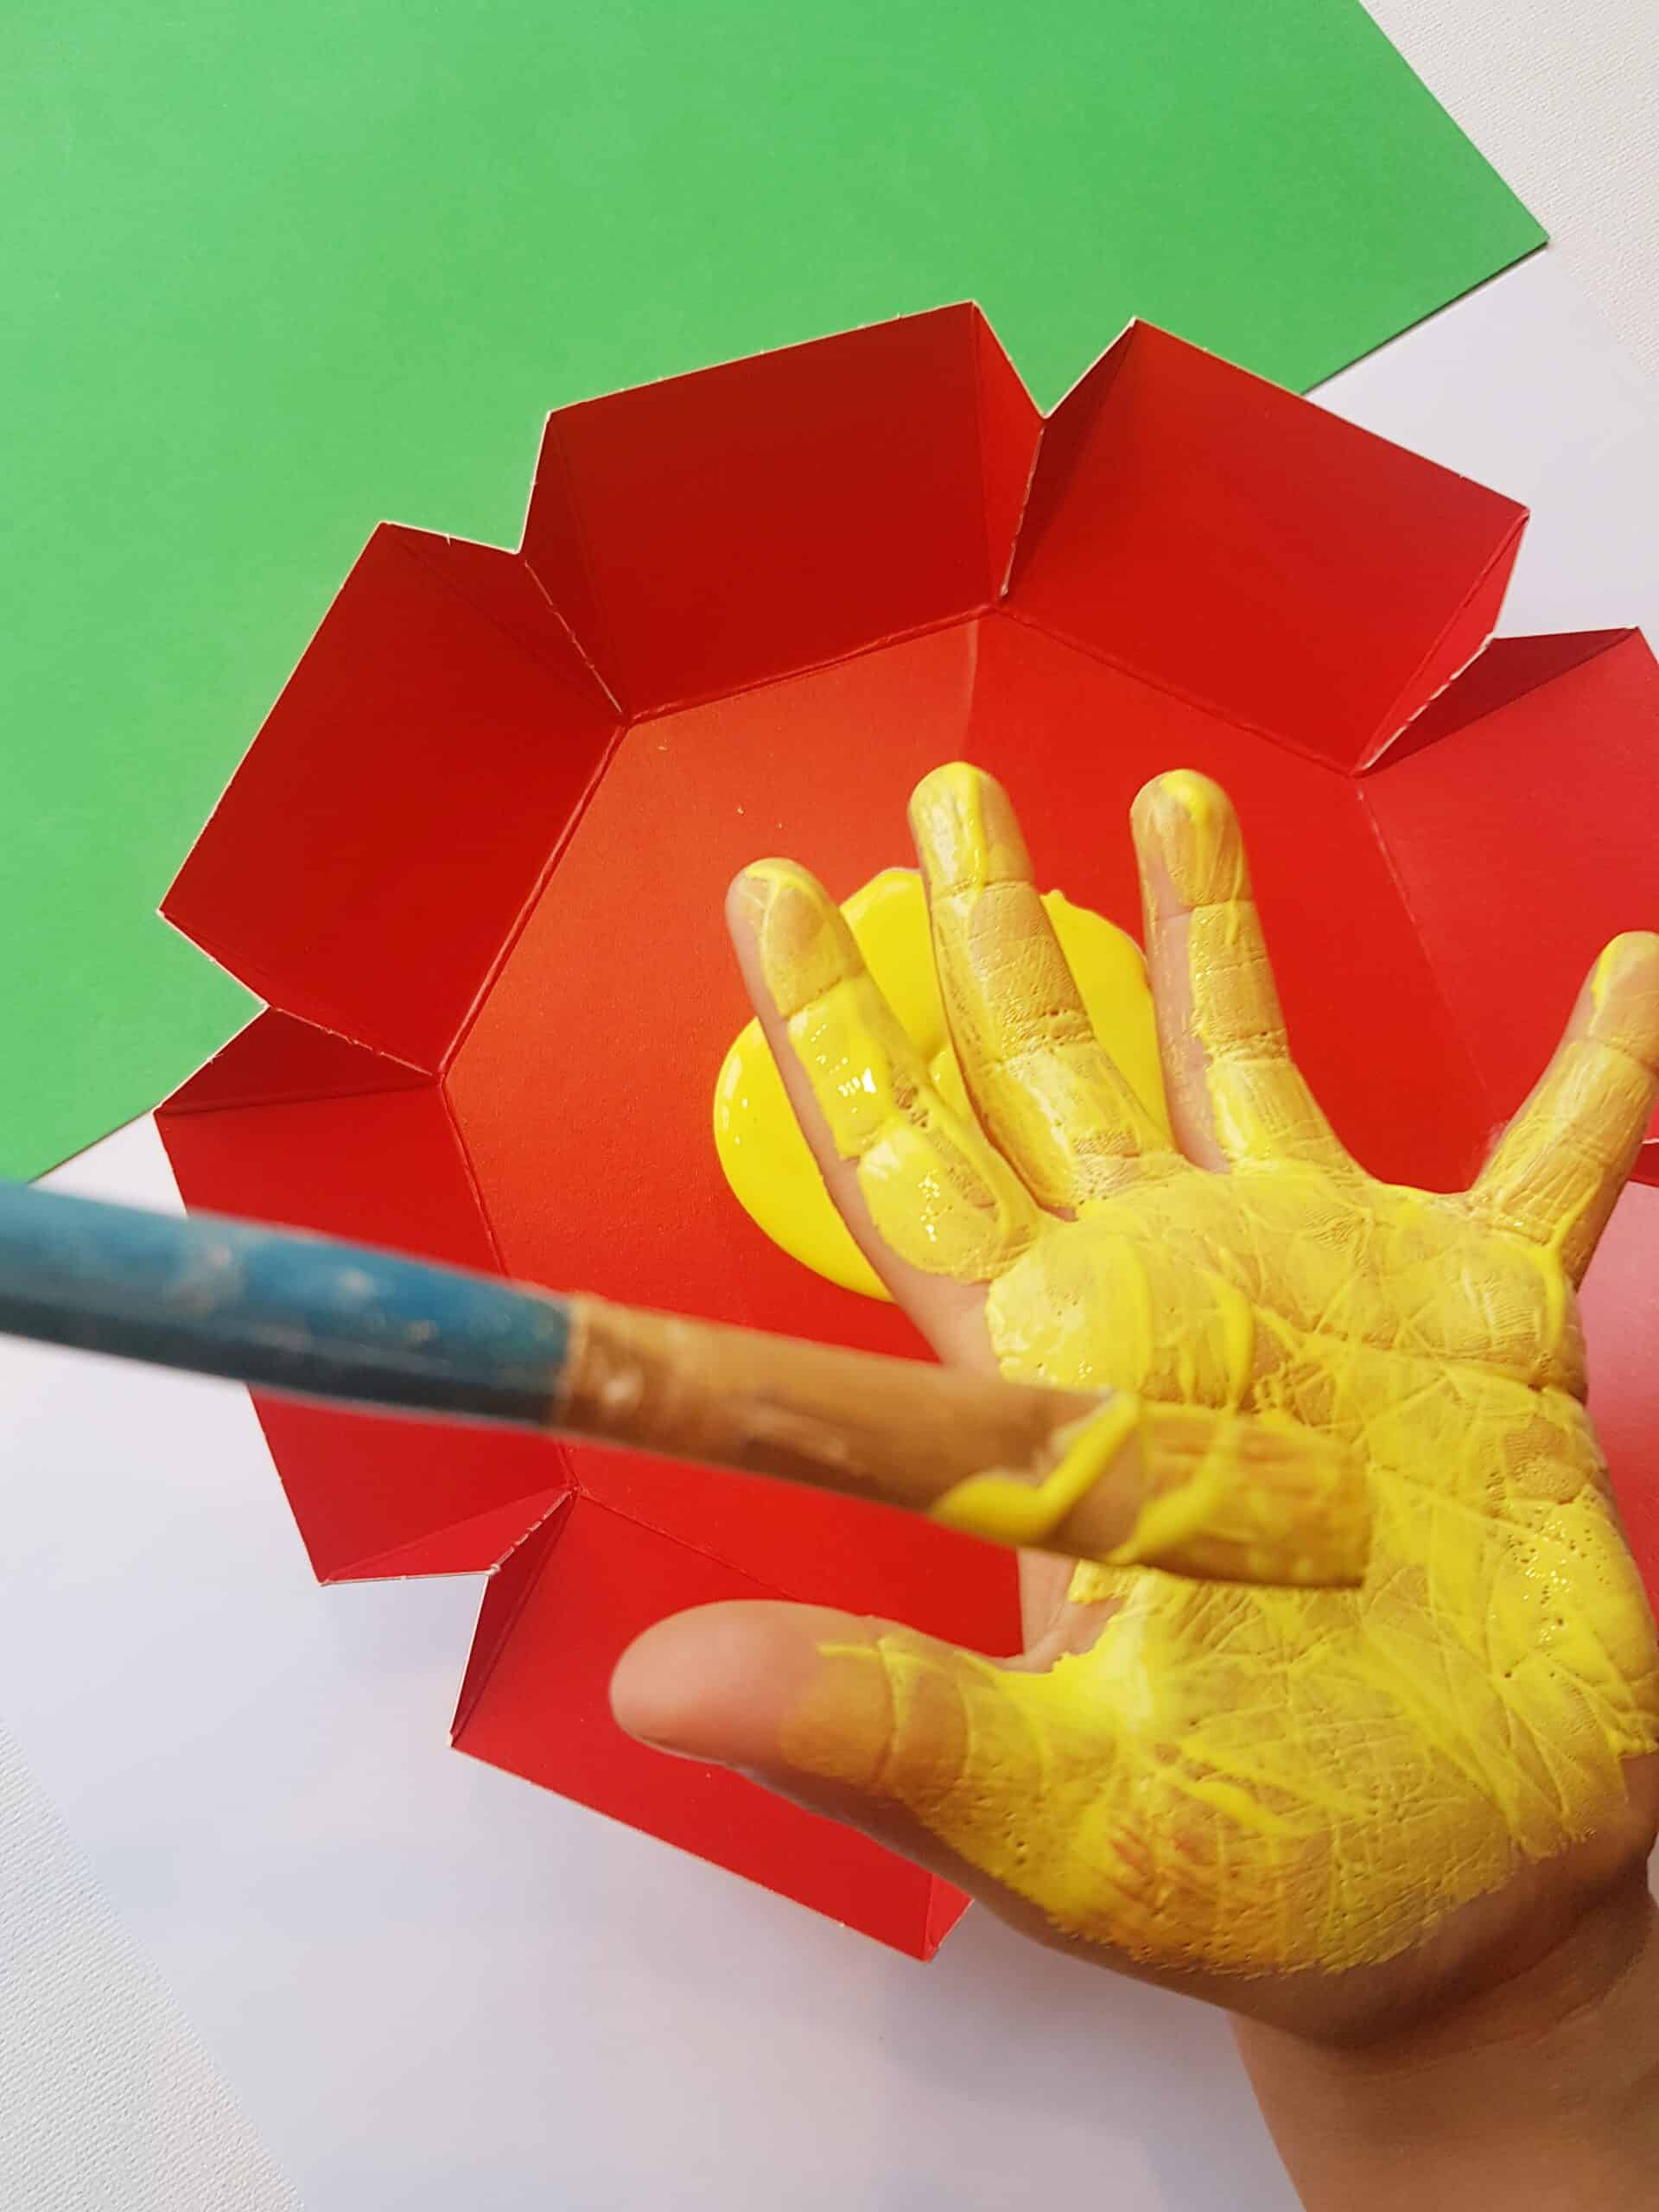 paint your hands